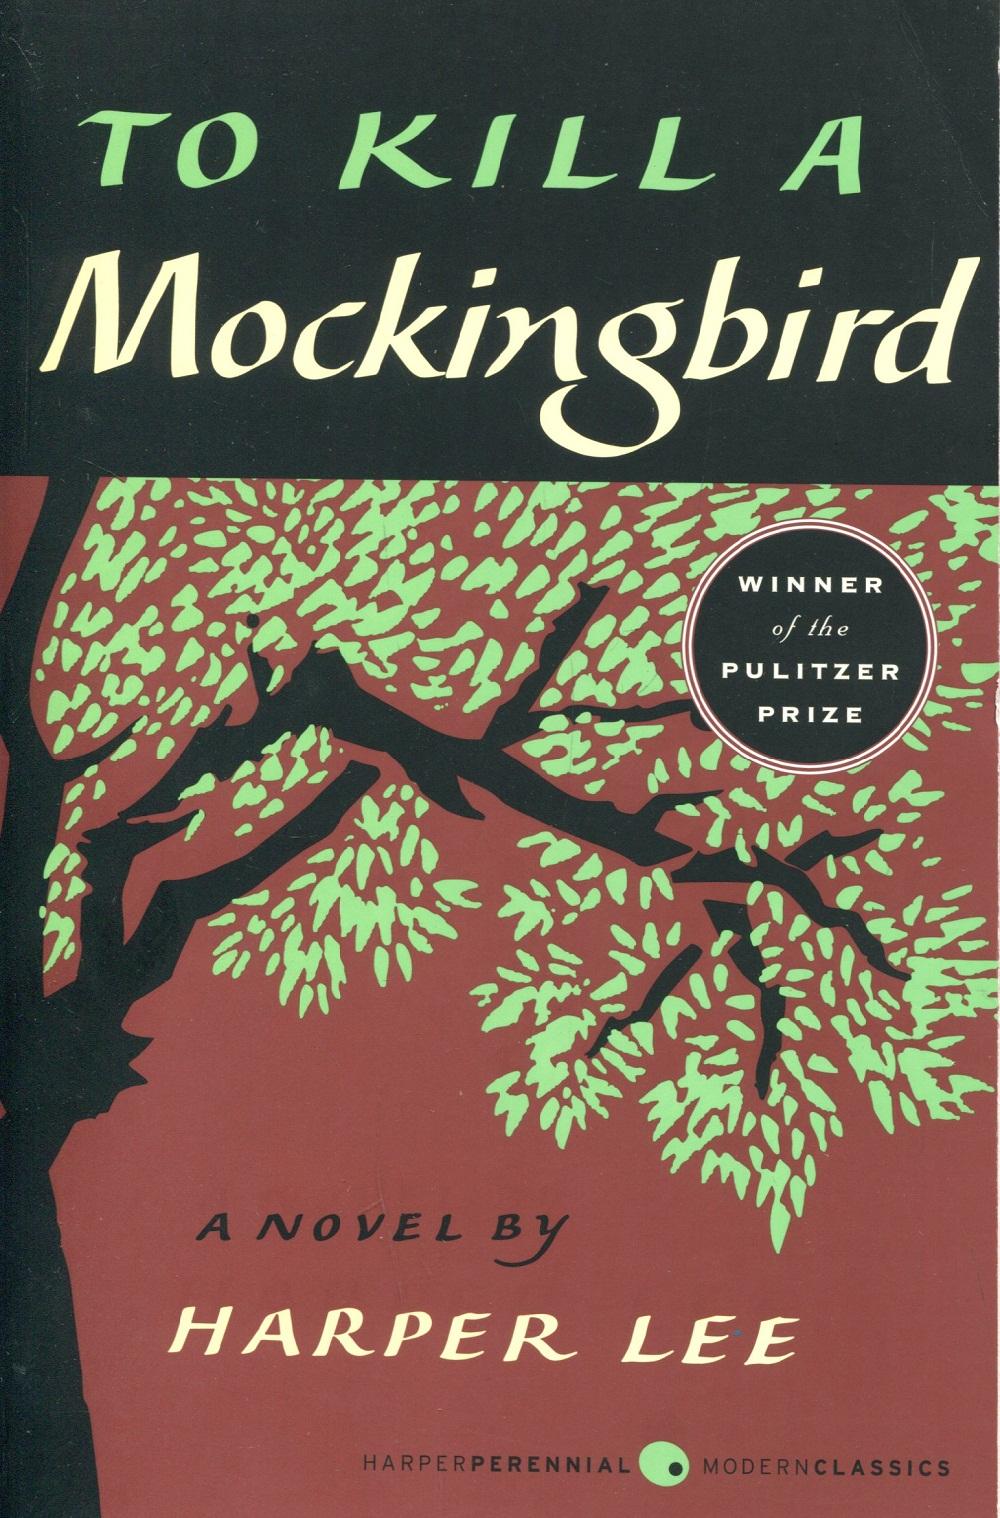 To Kill A Mockingbird (Reprint, 2007)